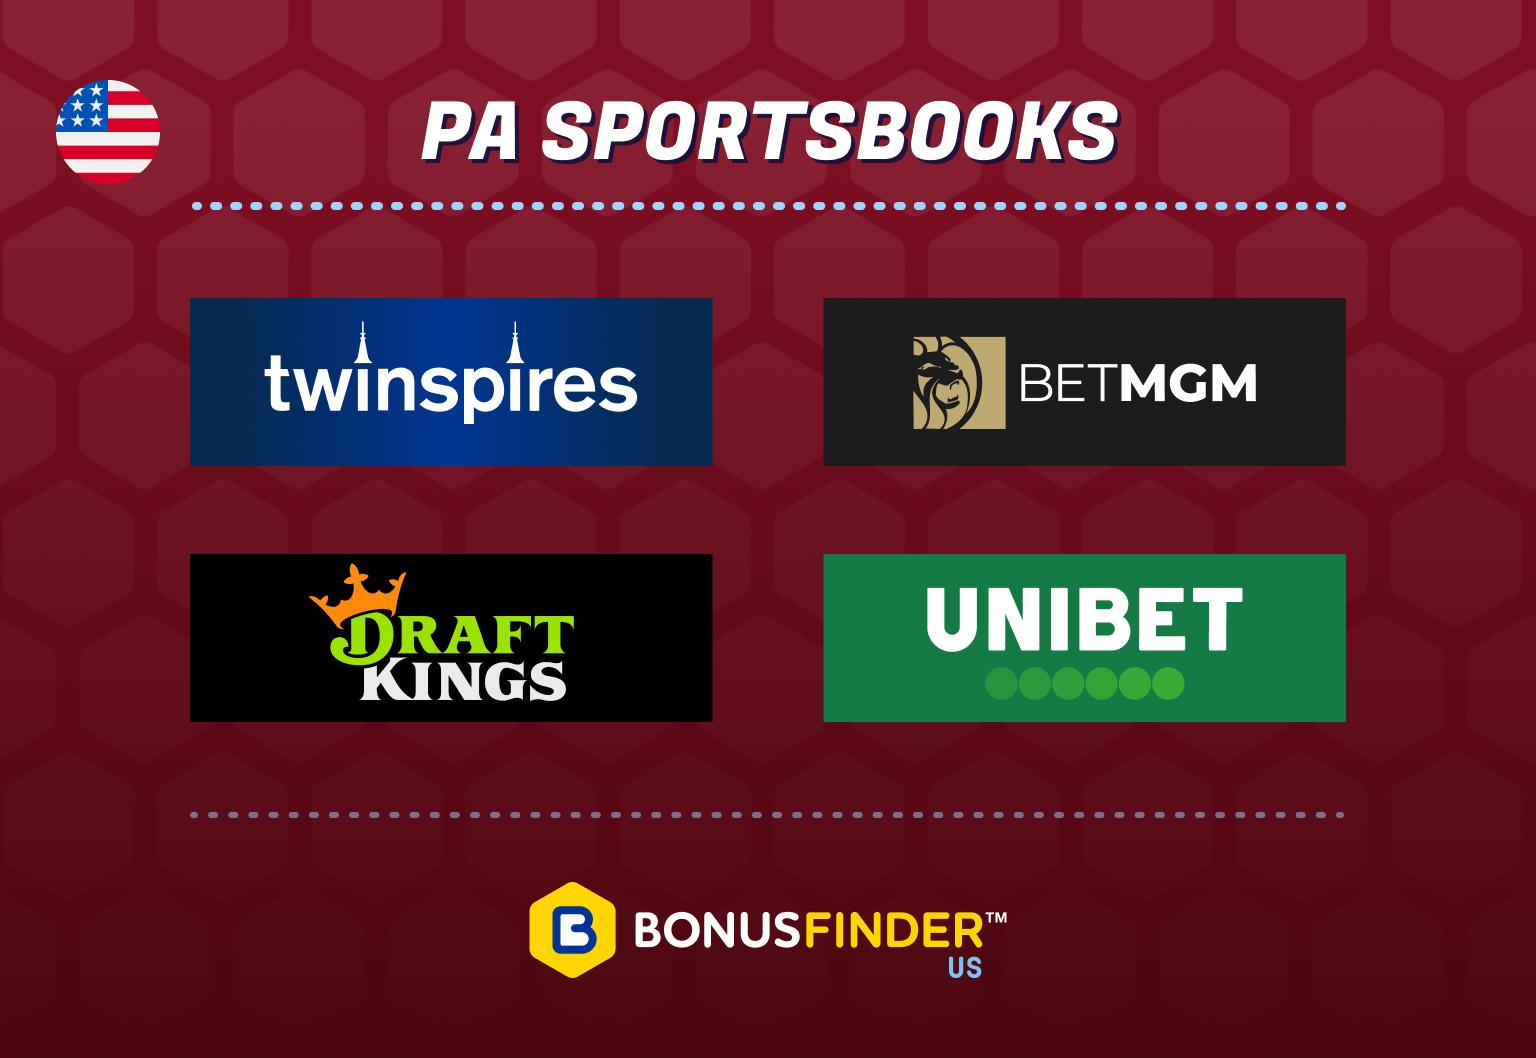 PA Sportsbooks